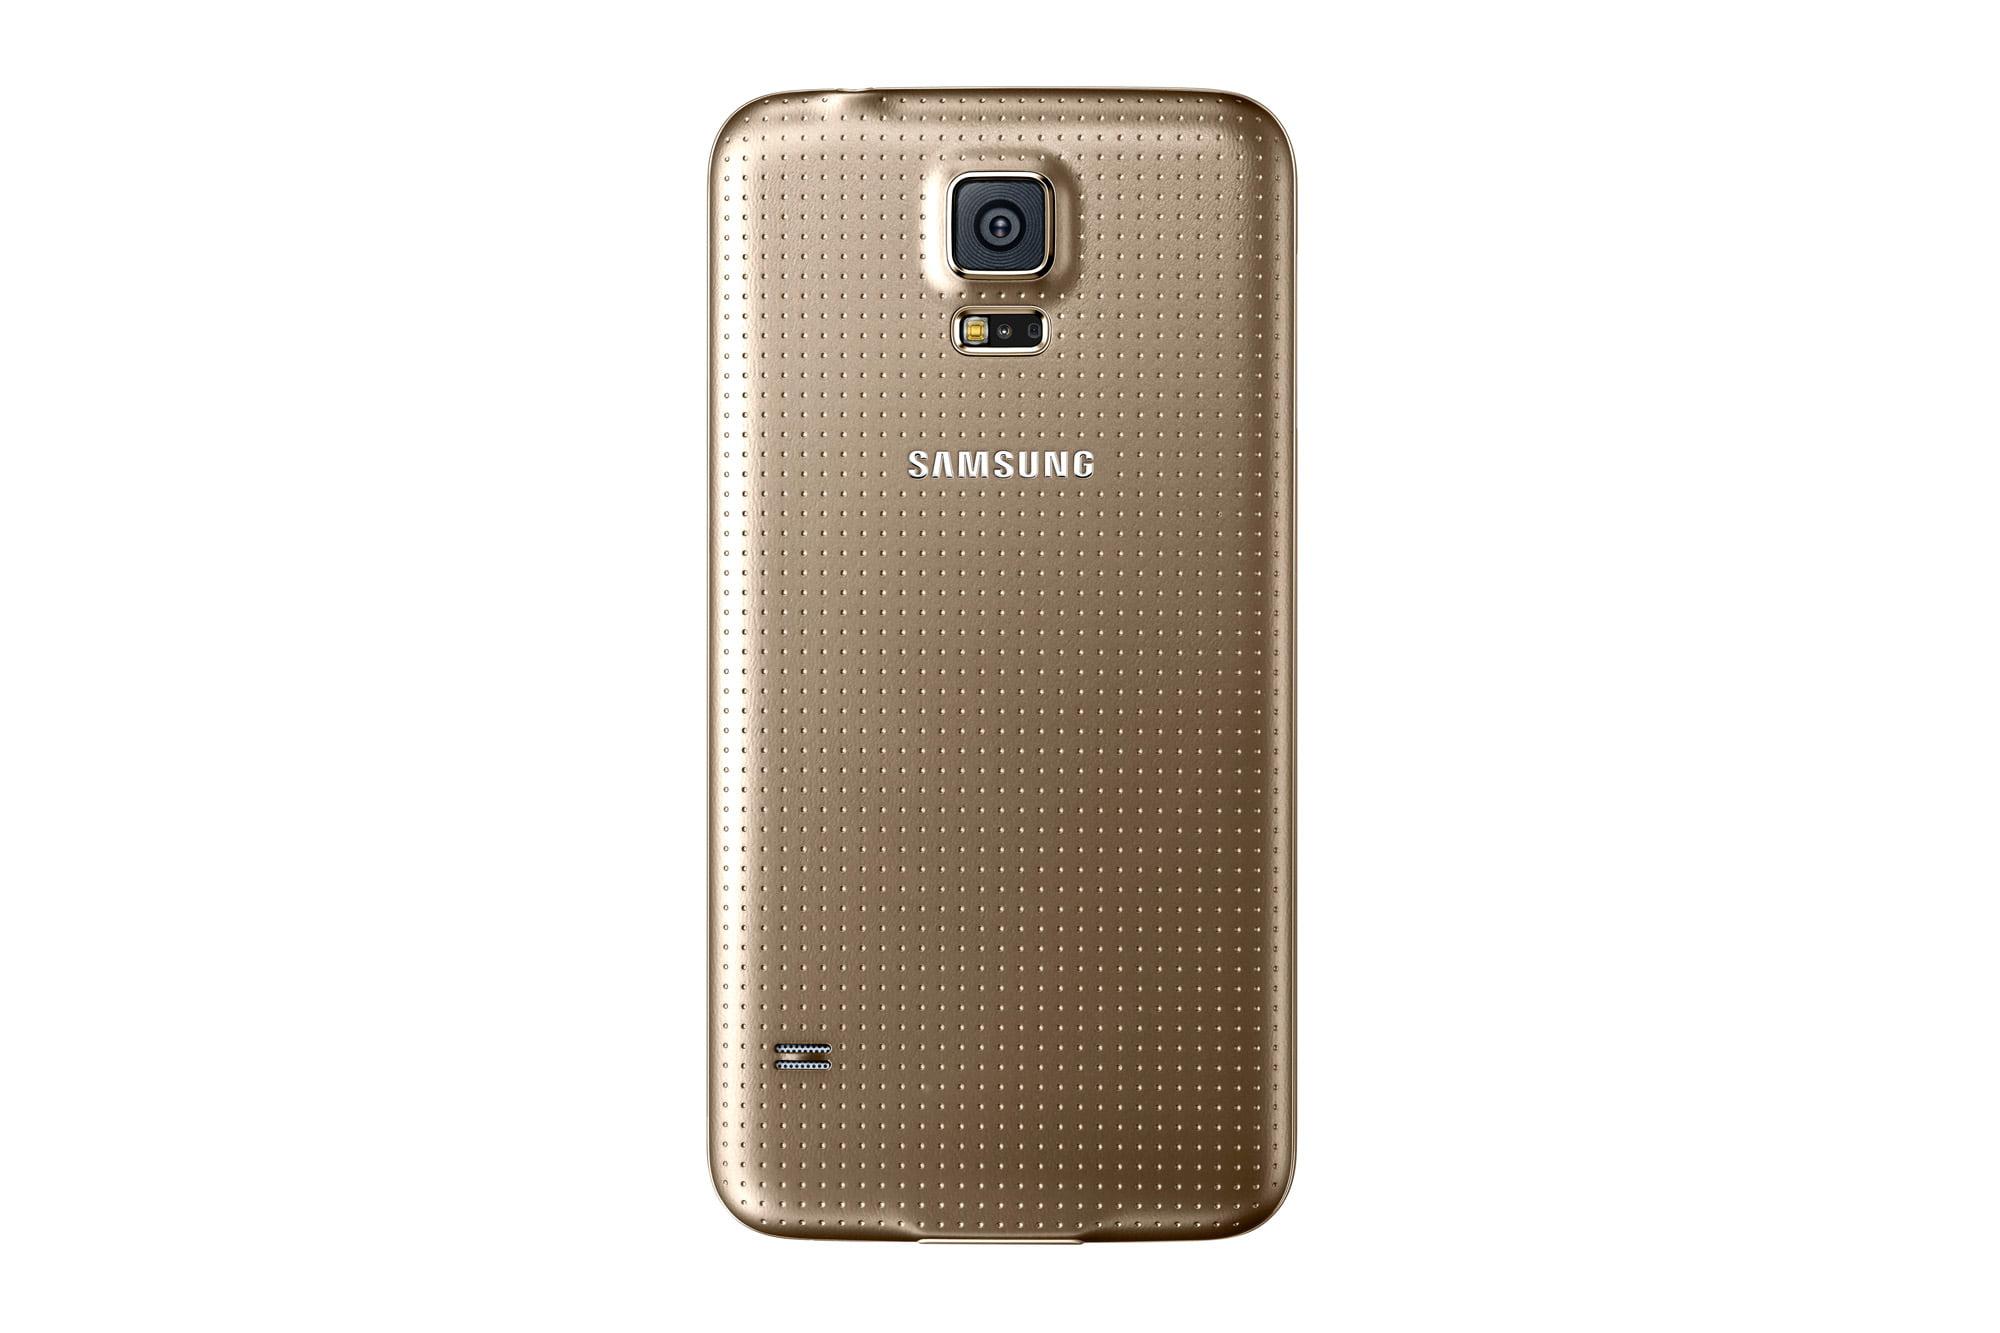 Samsung Galaxy S5 - Copper Gold